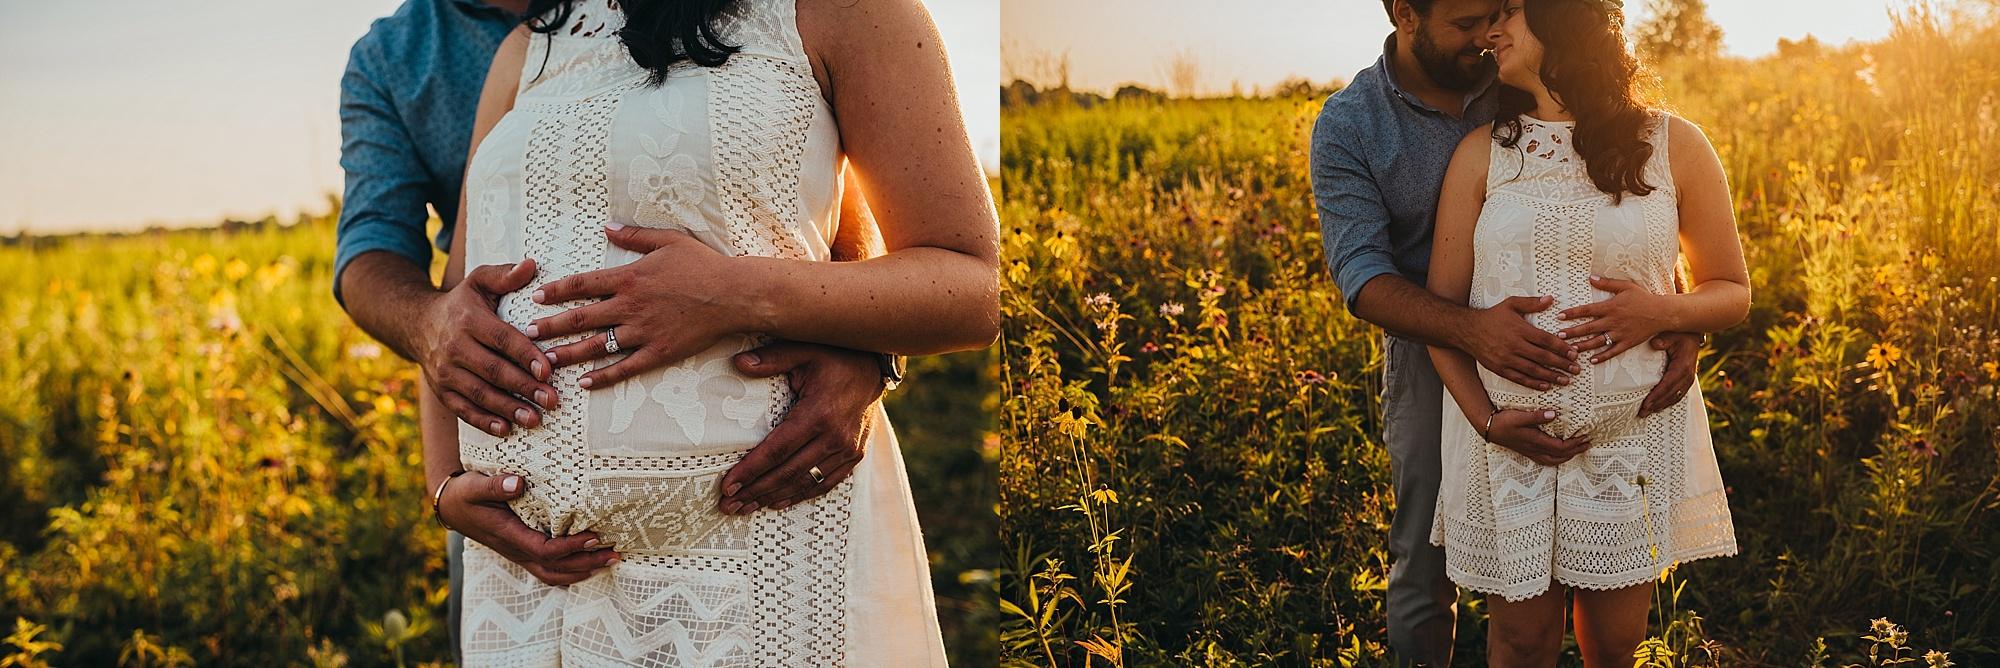 lauren-grayson-photography-cleveland-ohio-photographer-maternity-summer-outdoor-bohemian-fields-session_0488.jpg